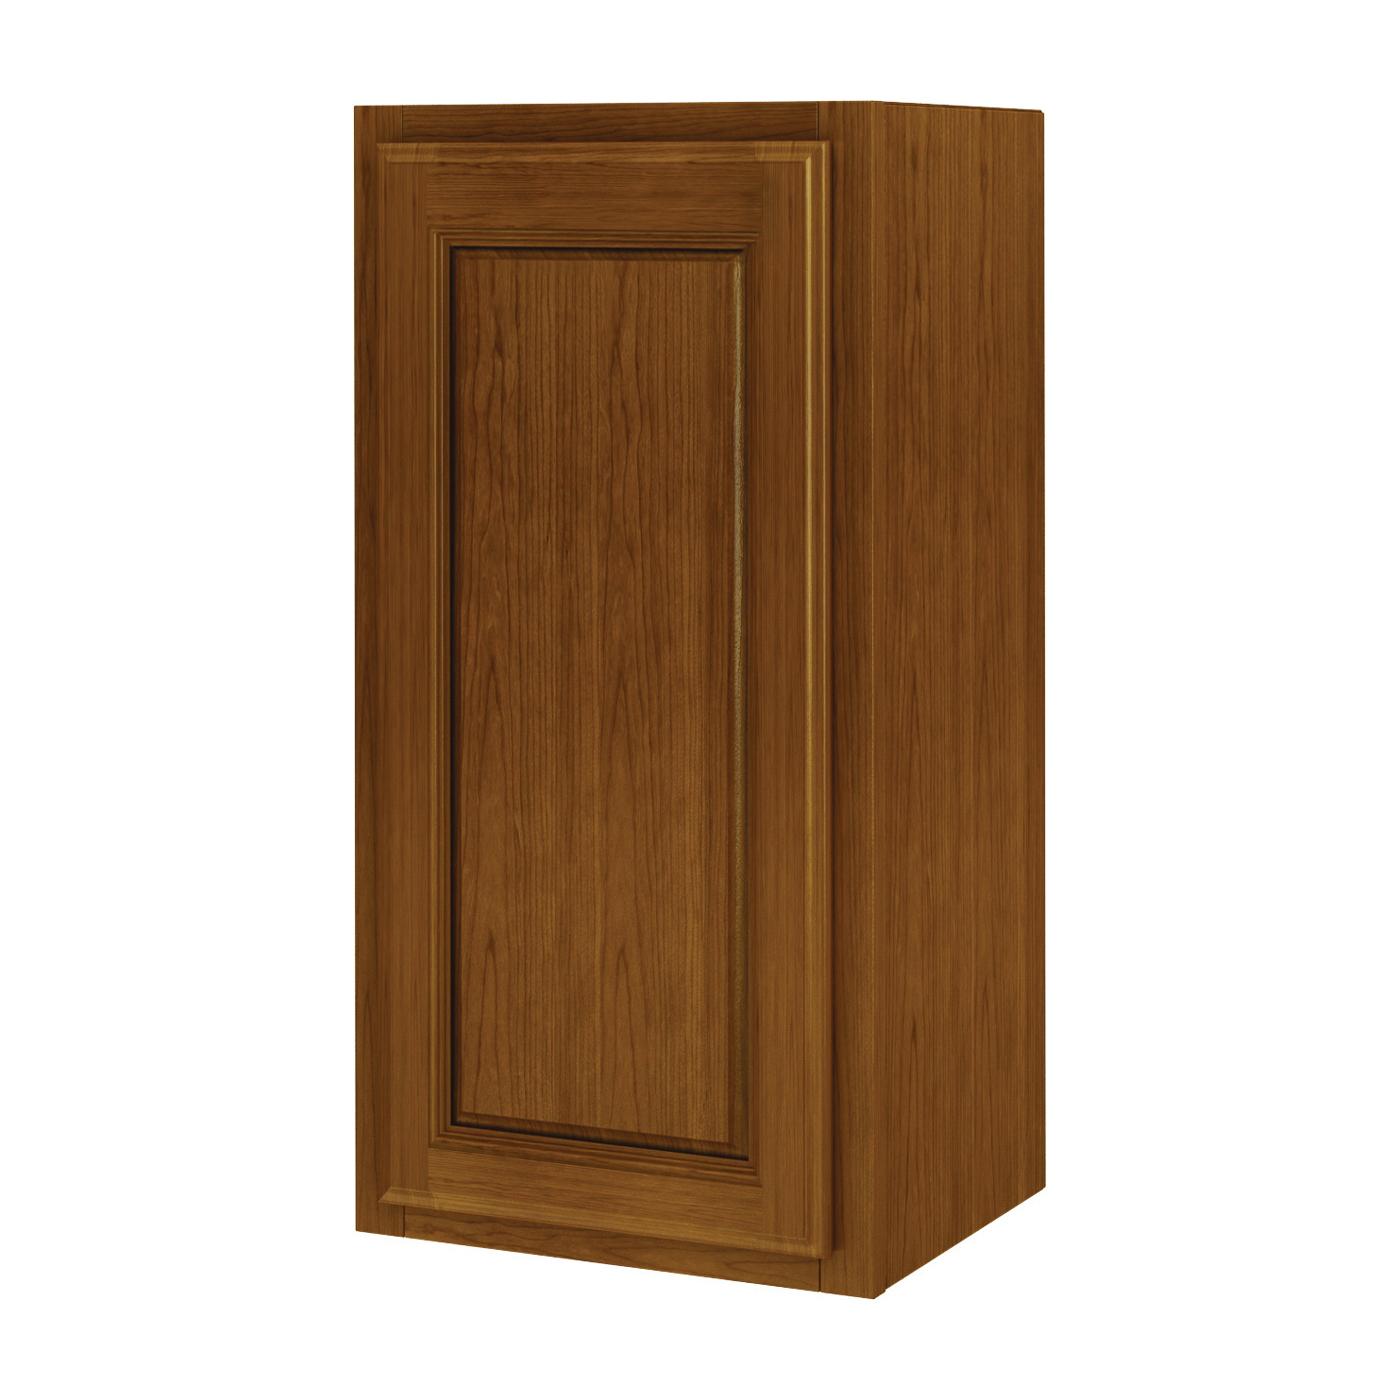 Picture of Sunco Randolph W2130RT/A Kitchen Cabinet, 21 in OAW, 12 in OAD, 30 in OAH, Wood, Amber, 2-Shelf